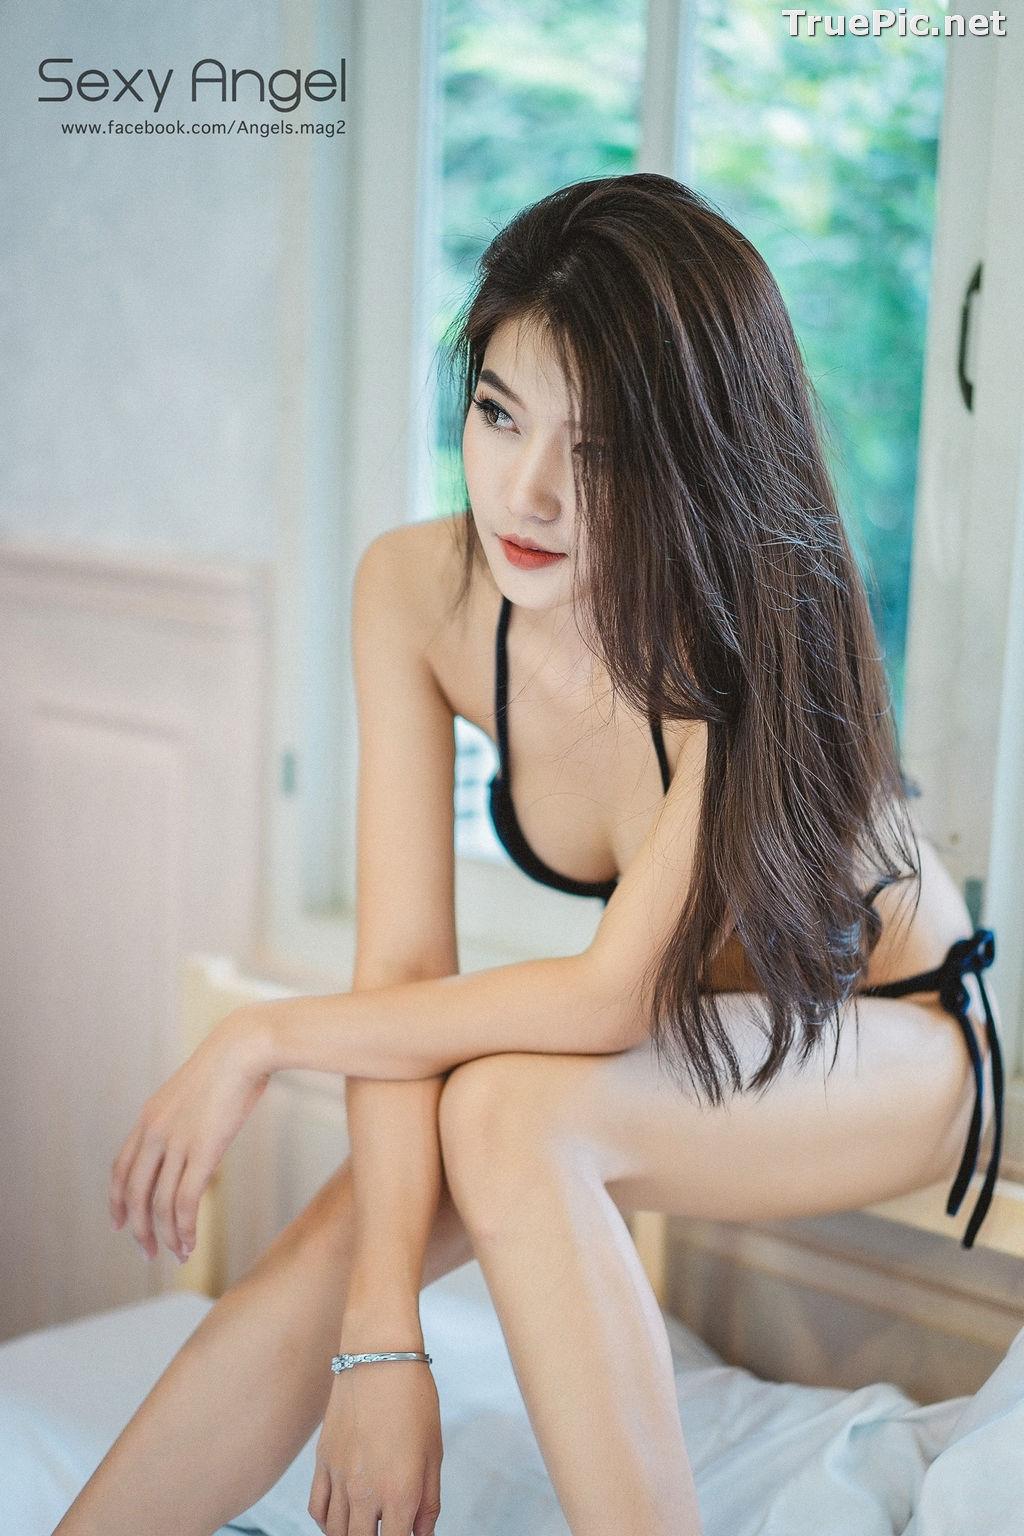 Image Thailand Model - Saruda Chalermsaen (EveAva) - Sexy Bikini Angel - TruePic.net - Picture-11